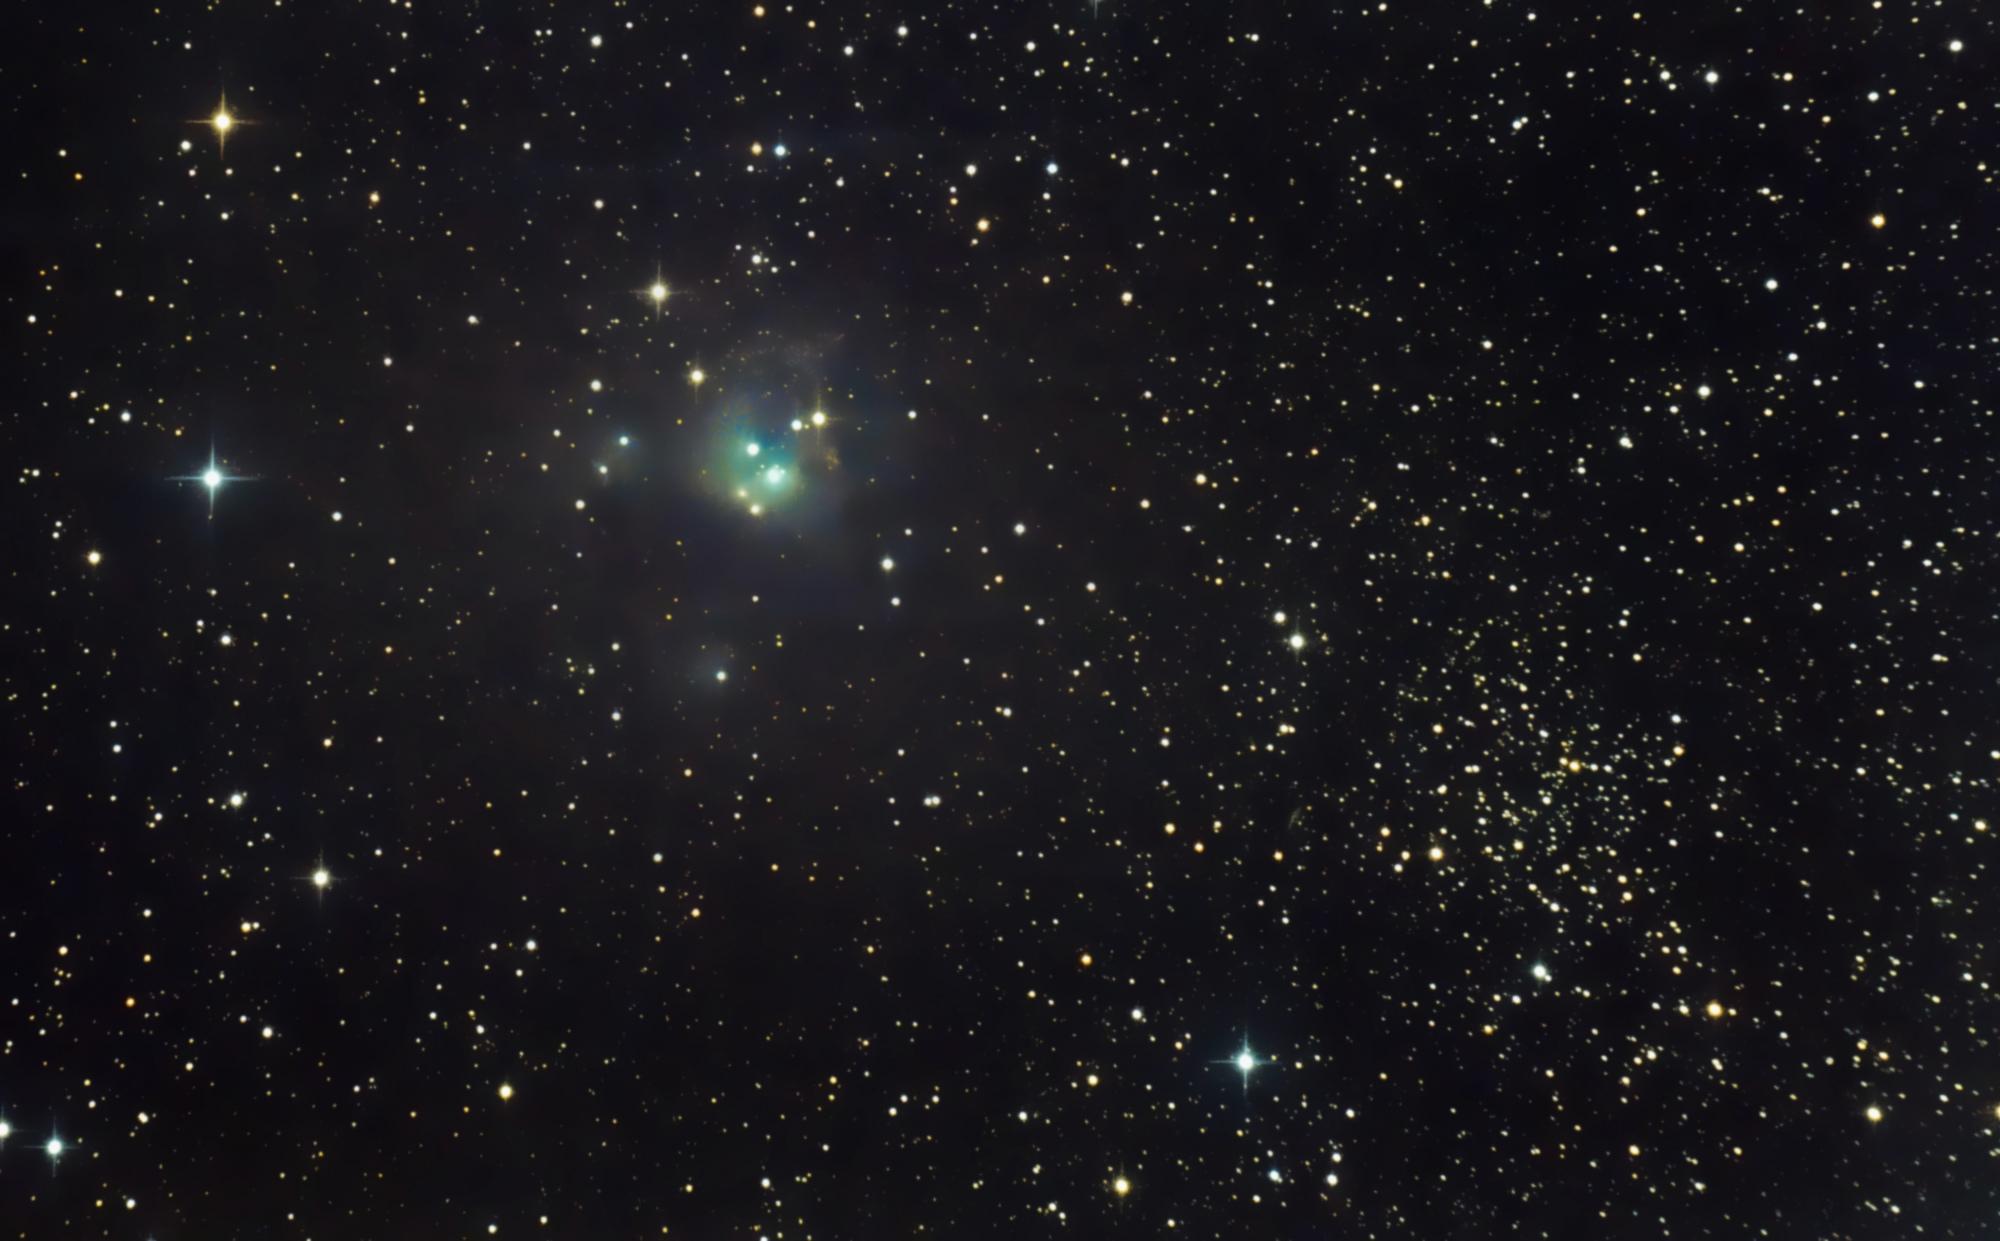 5f4a3b68e6cf4_NGC7129.thumb.jpg.e1aa588c301eb4ce308d4a215d7b3394.jpg